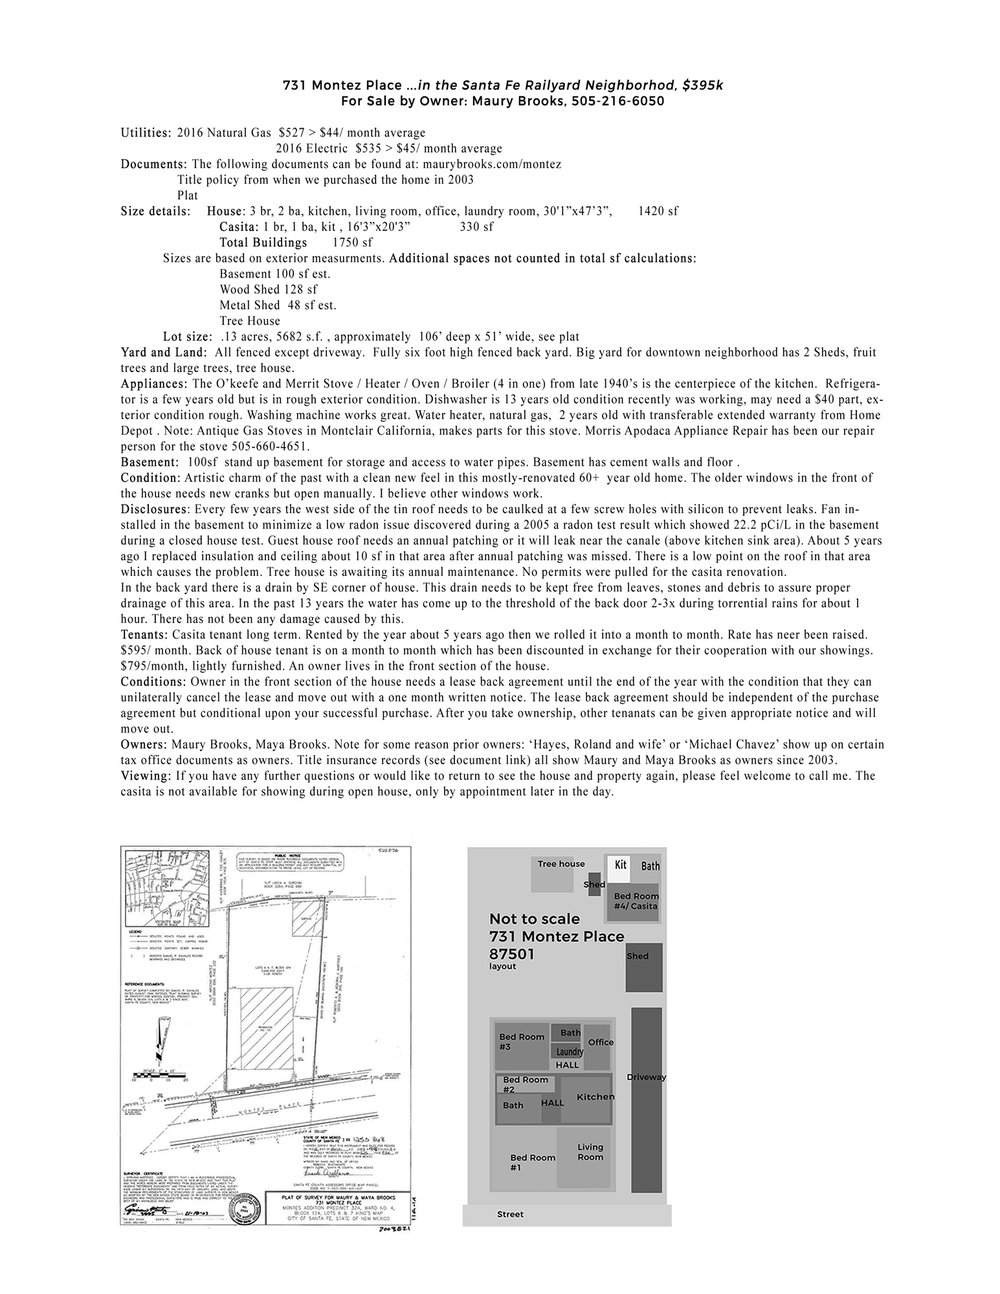 handout-summary-p2.jpg